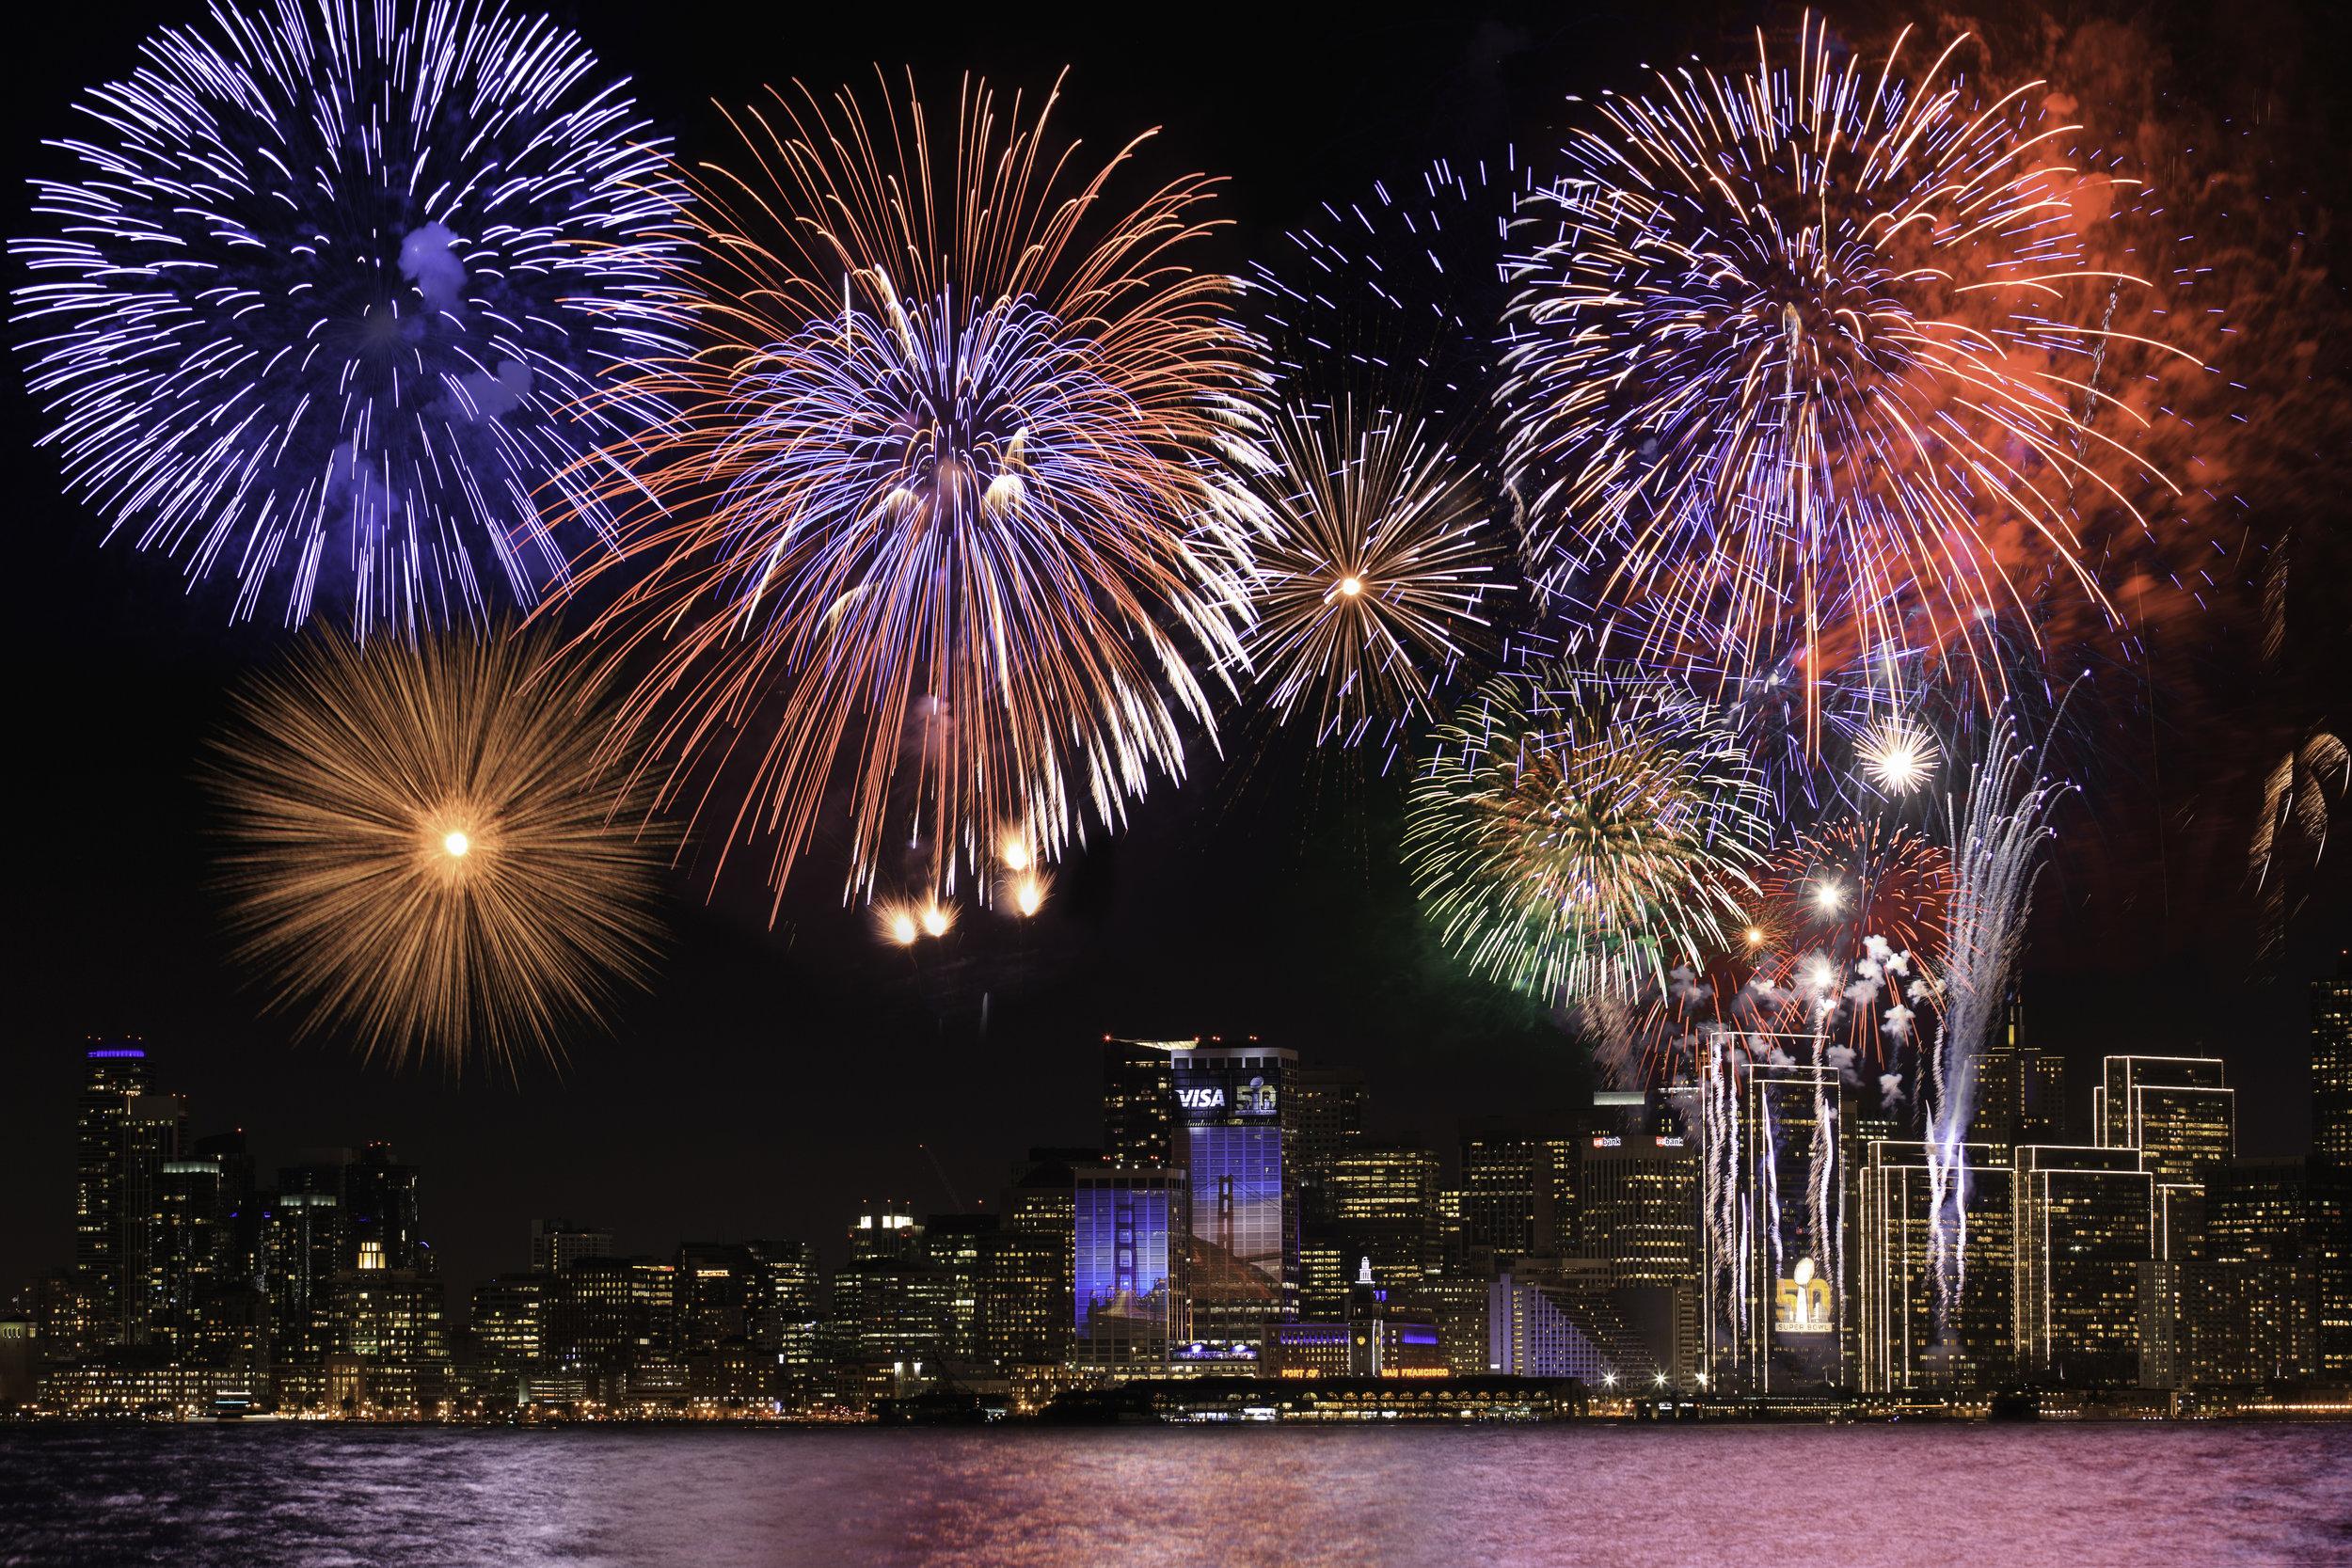 02052016_5DMKIII_SB50_Fireworks-91.jpg